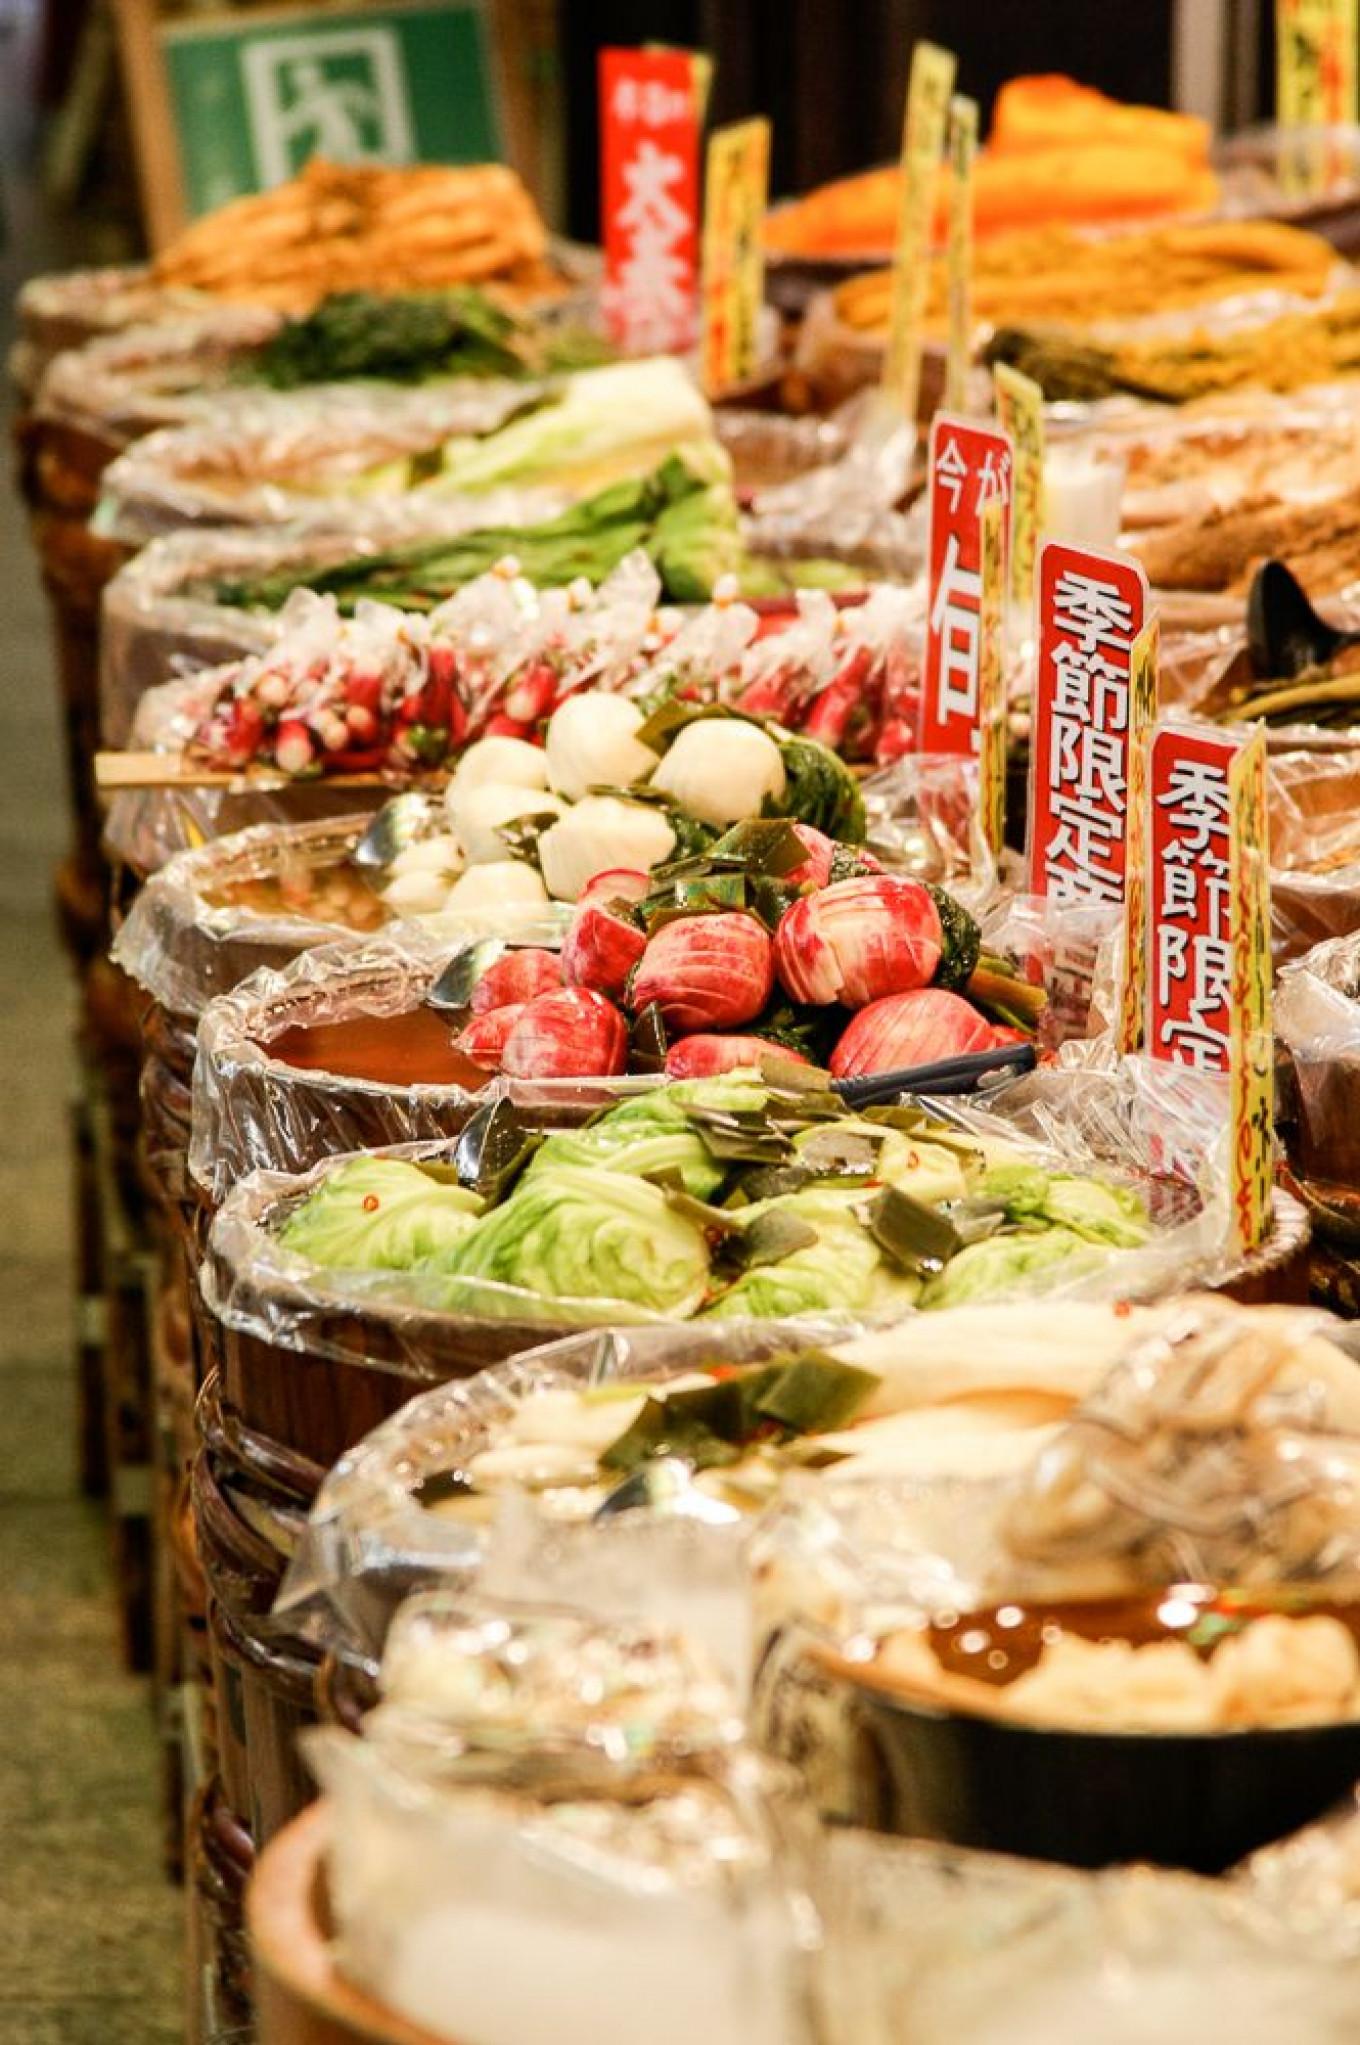 Fermented vegetables Kyoto market. Jennifer Eremeeva / MT